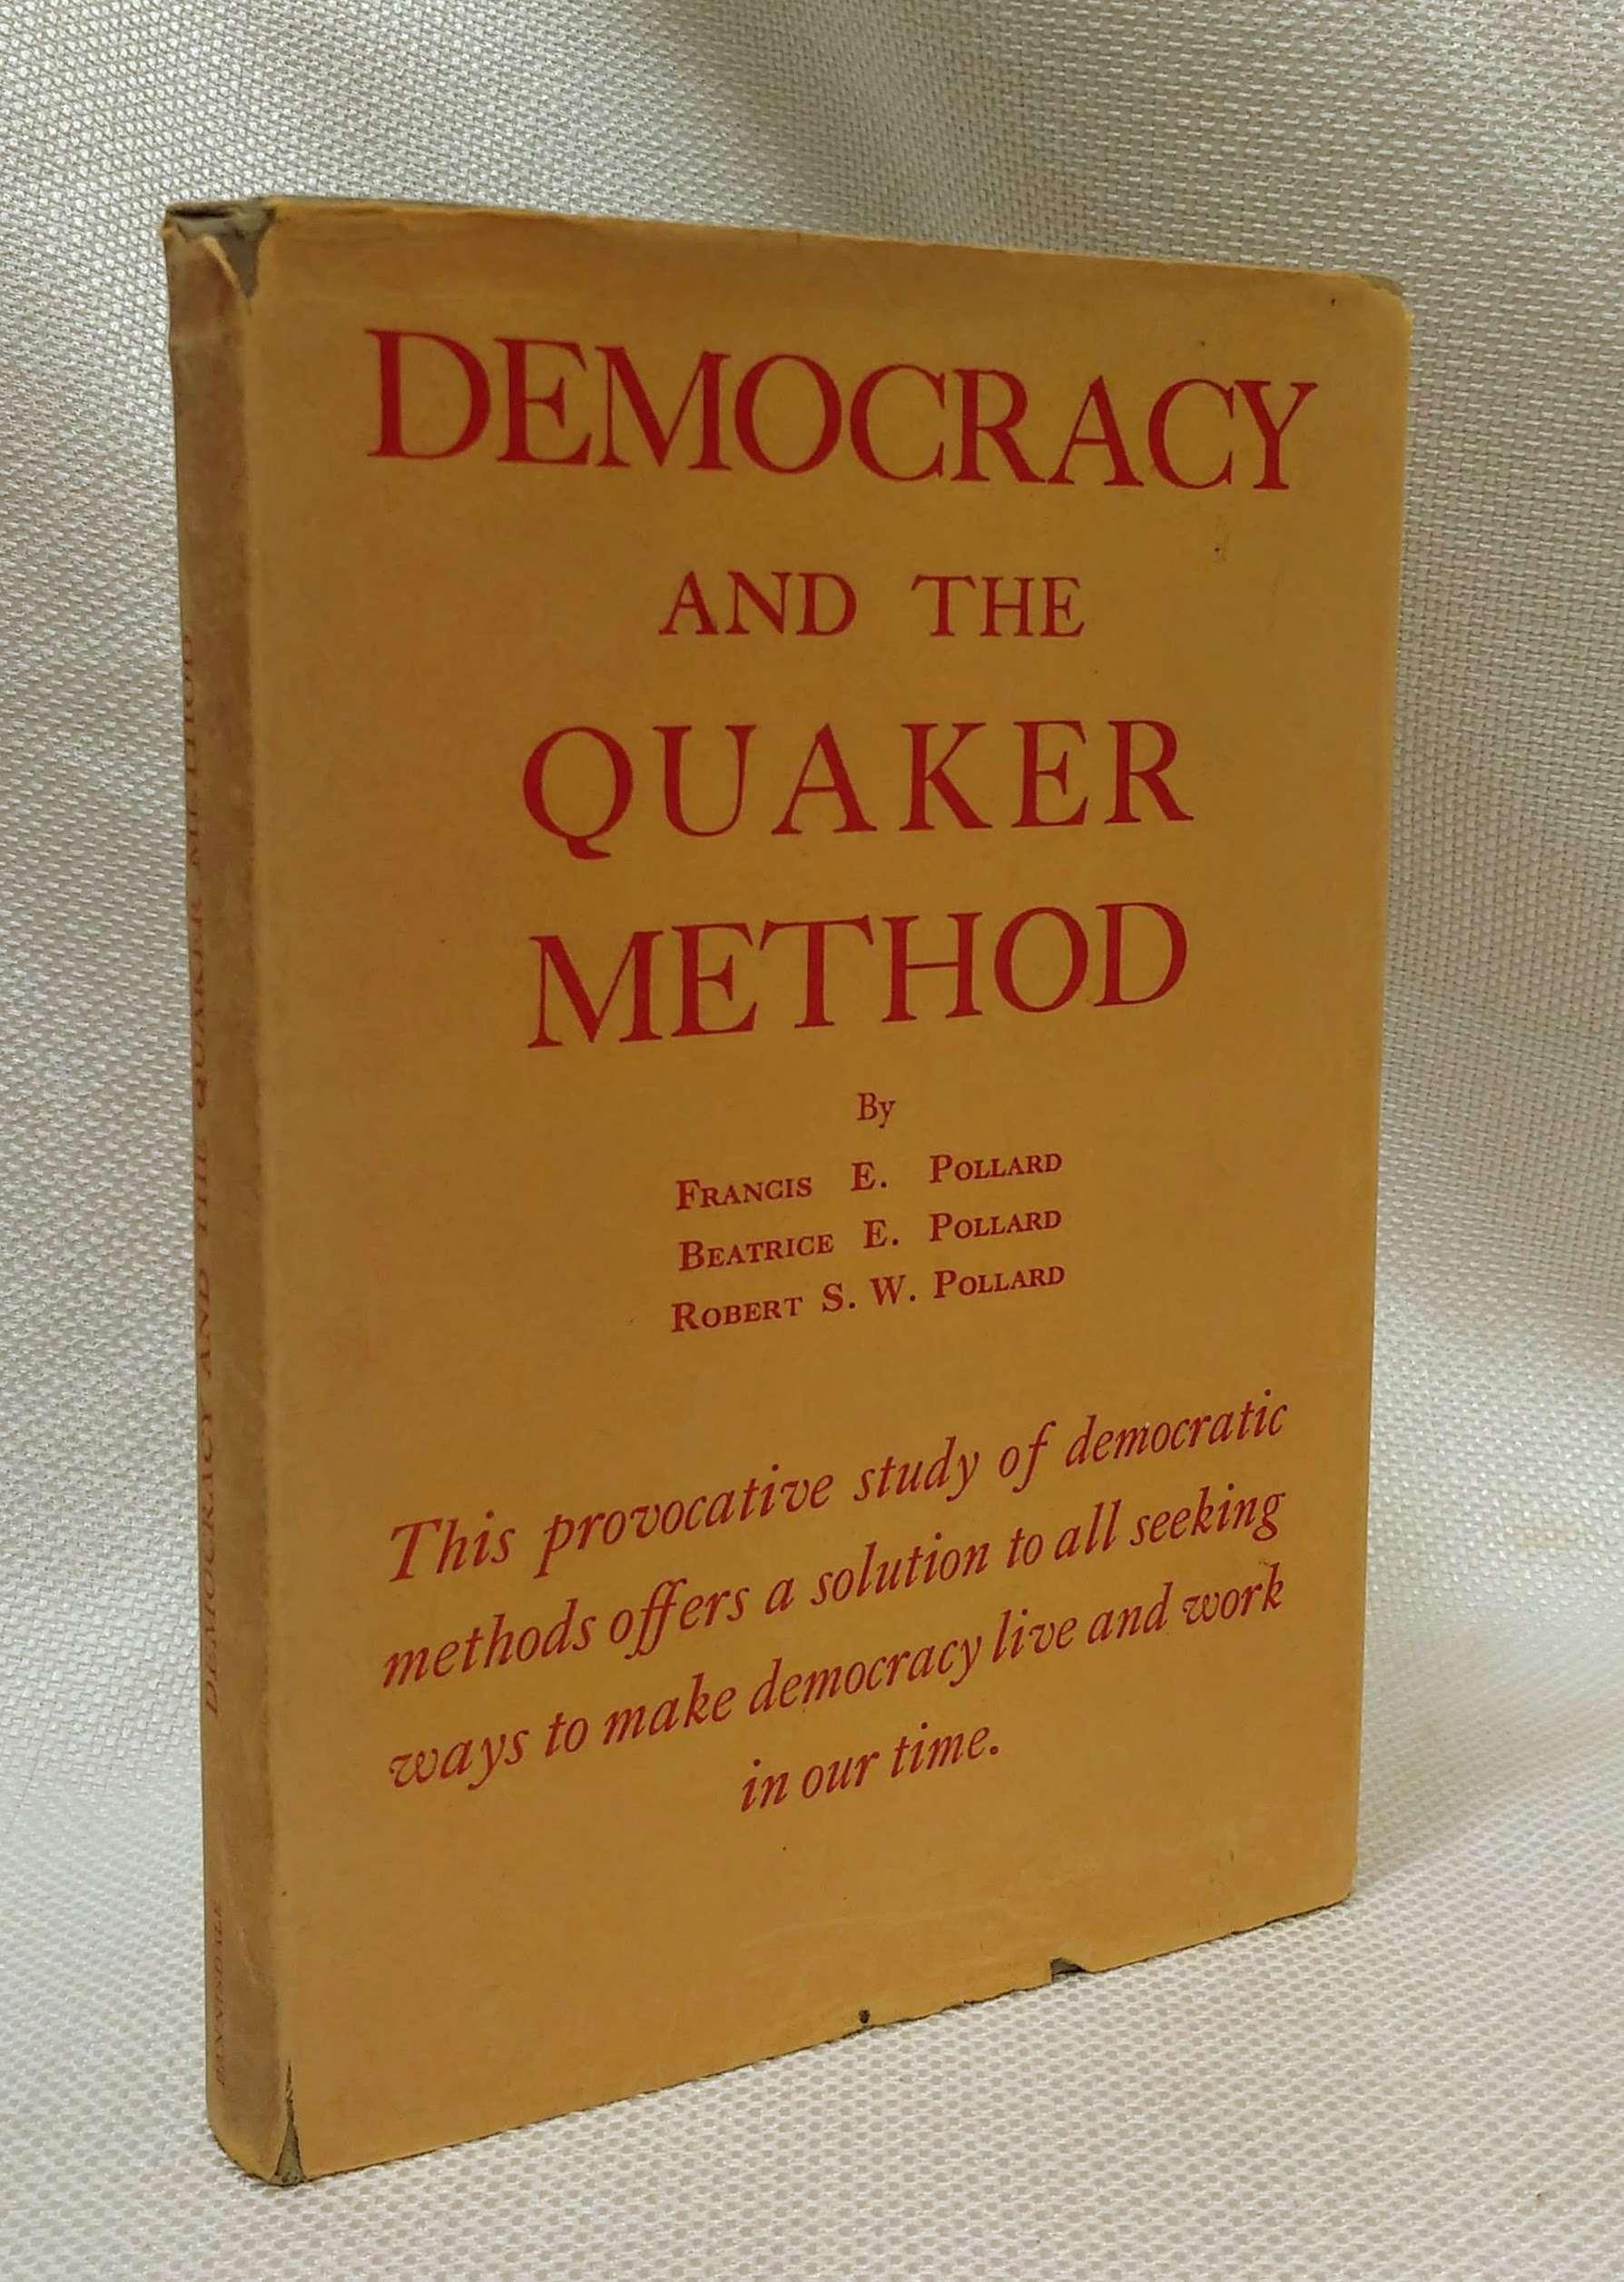 Democracy and the Quaker method,, Pollard, Francis Edward